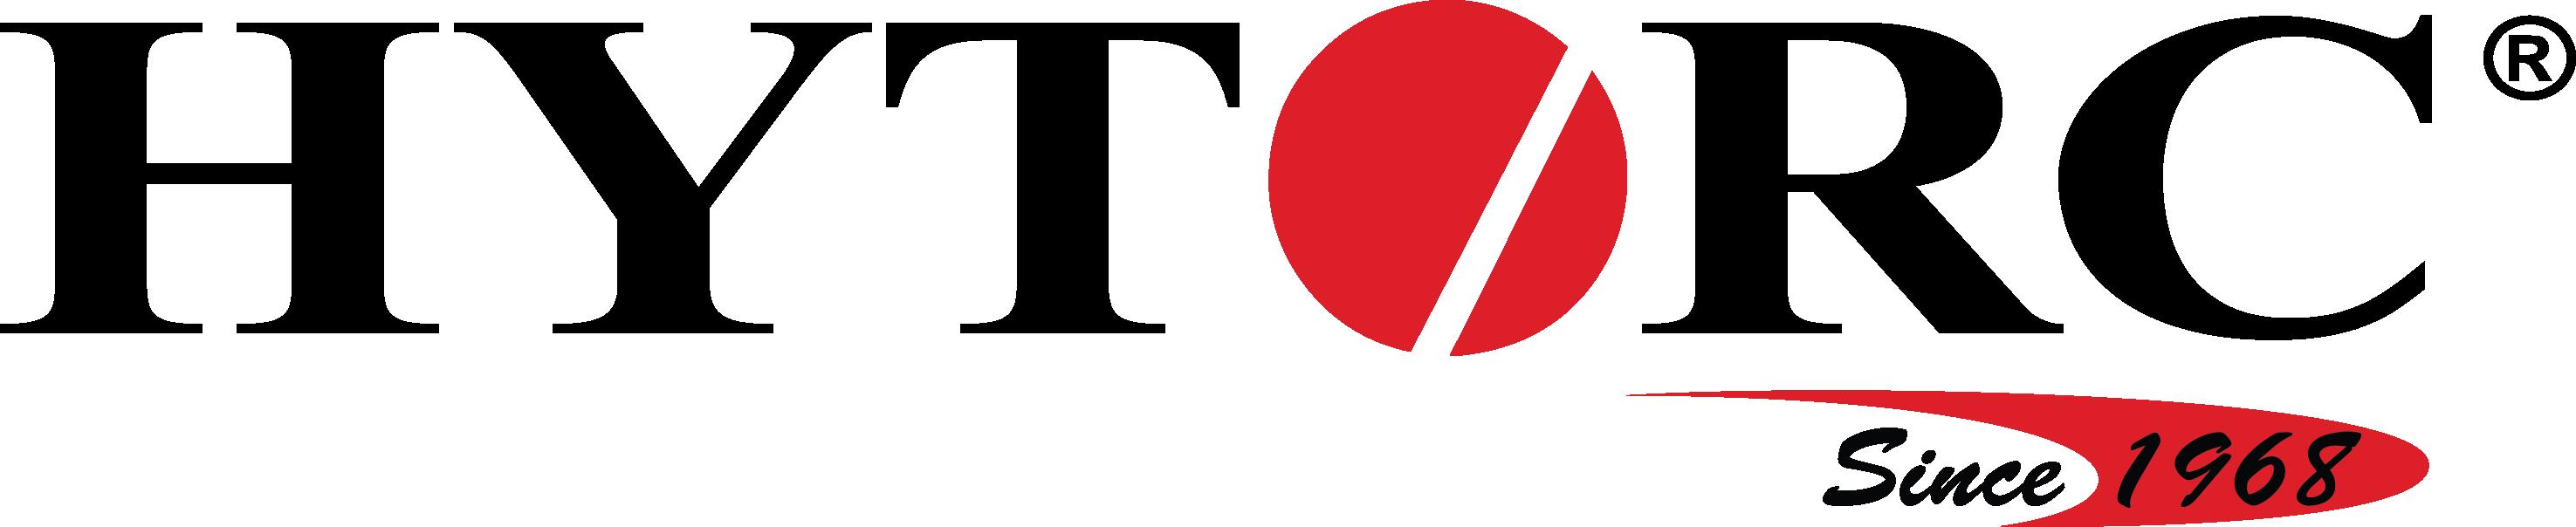 HYTORC-Black-Red-Logo-swoosh.png